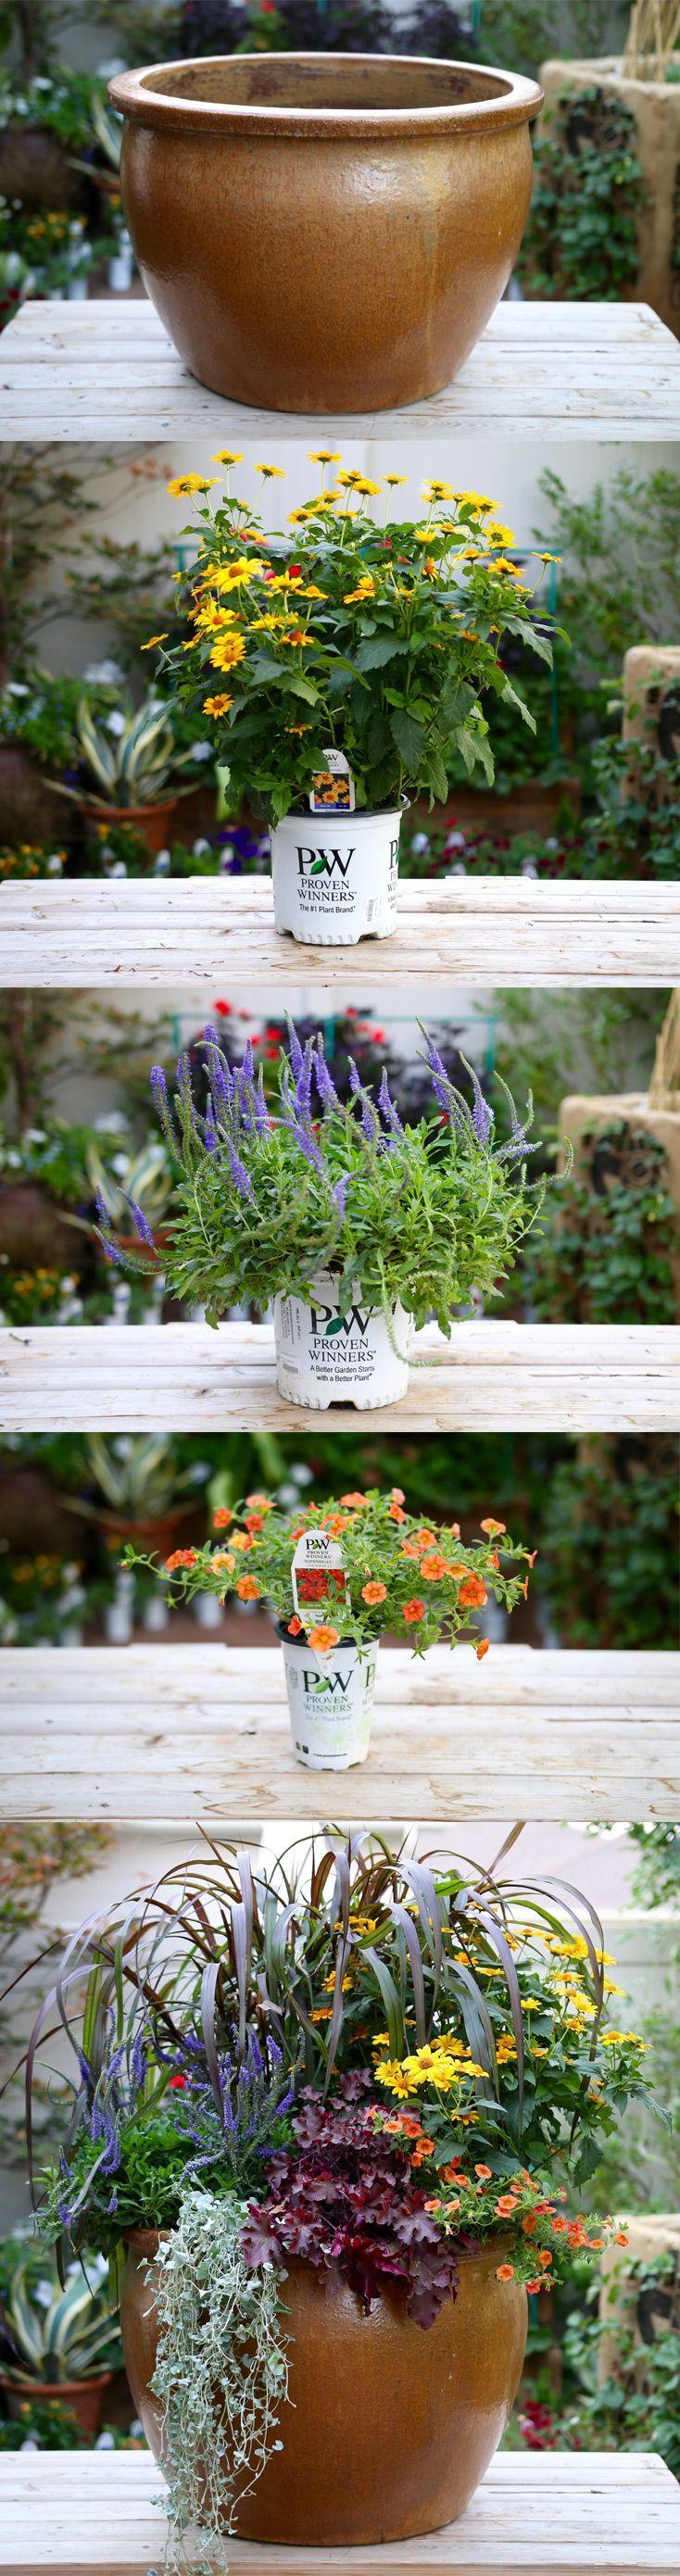 Best Gardening Landscape Images On Pinterest Gardening